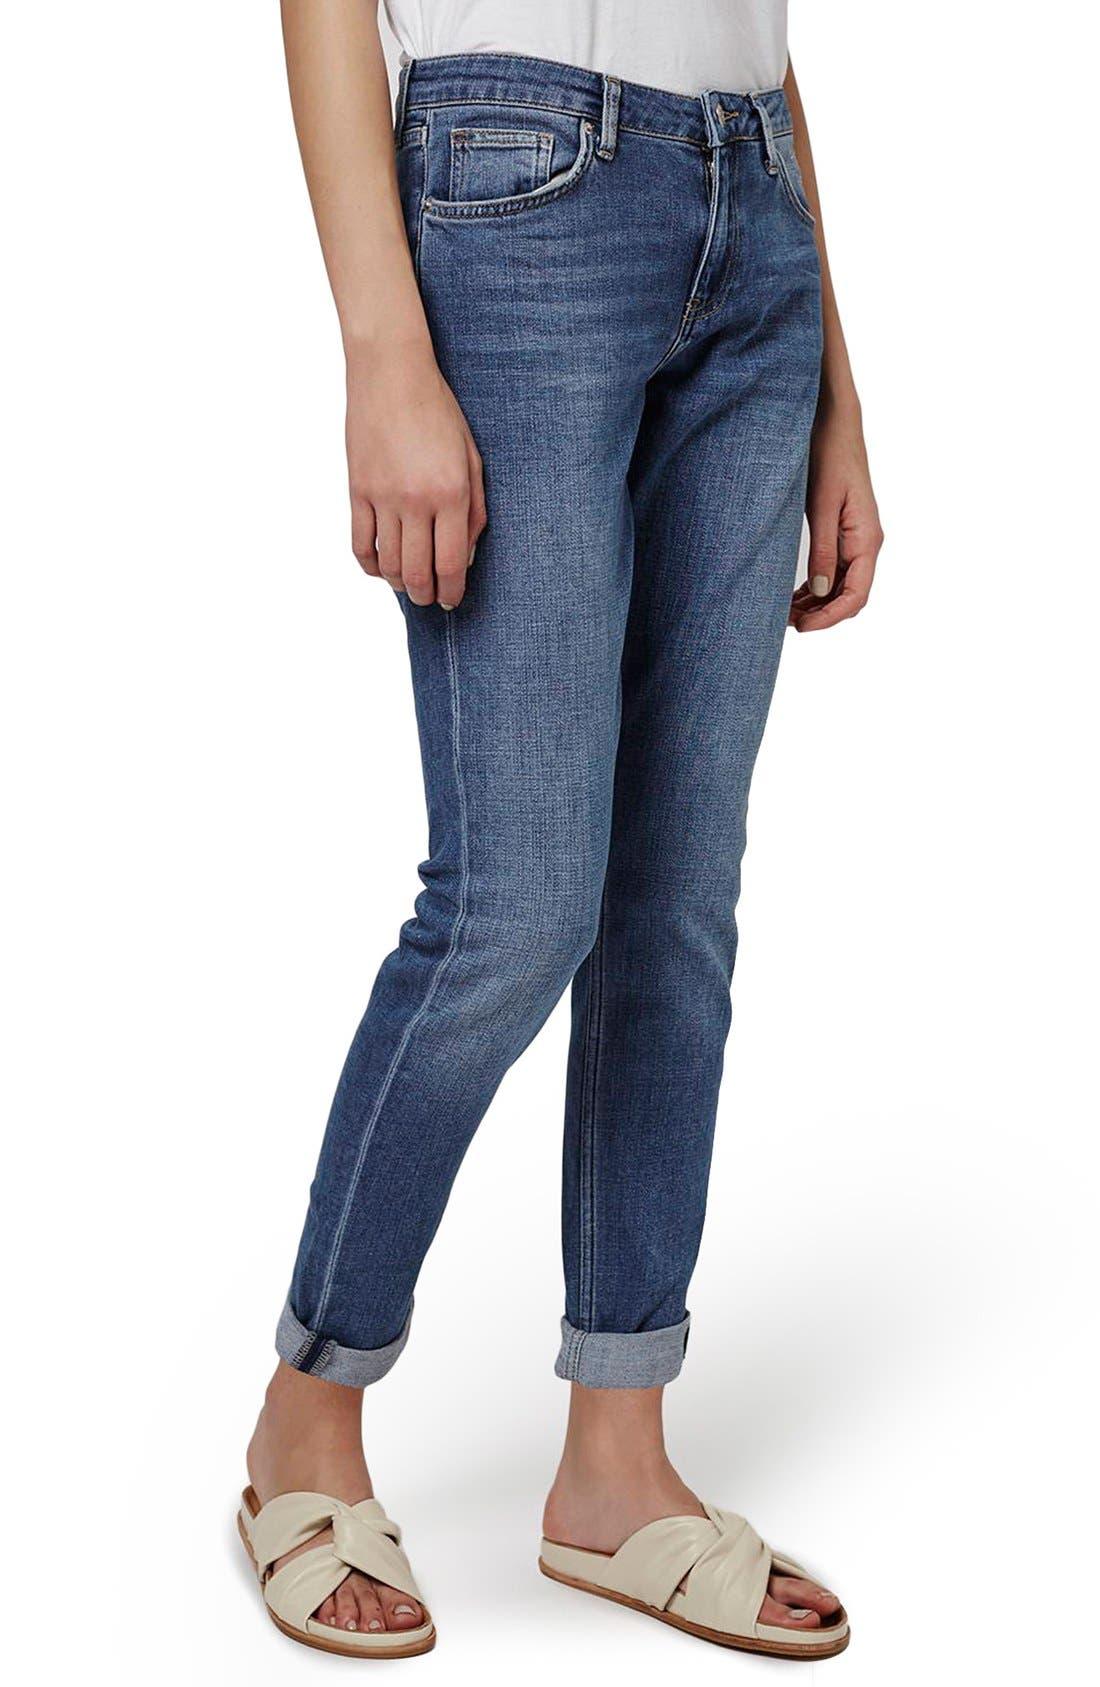 Alternate Image 1 Selected - Topshop 'Lucas' Boyfriend Jeans (Indigo)